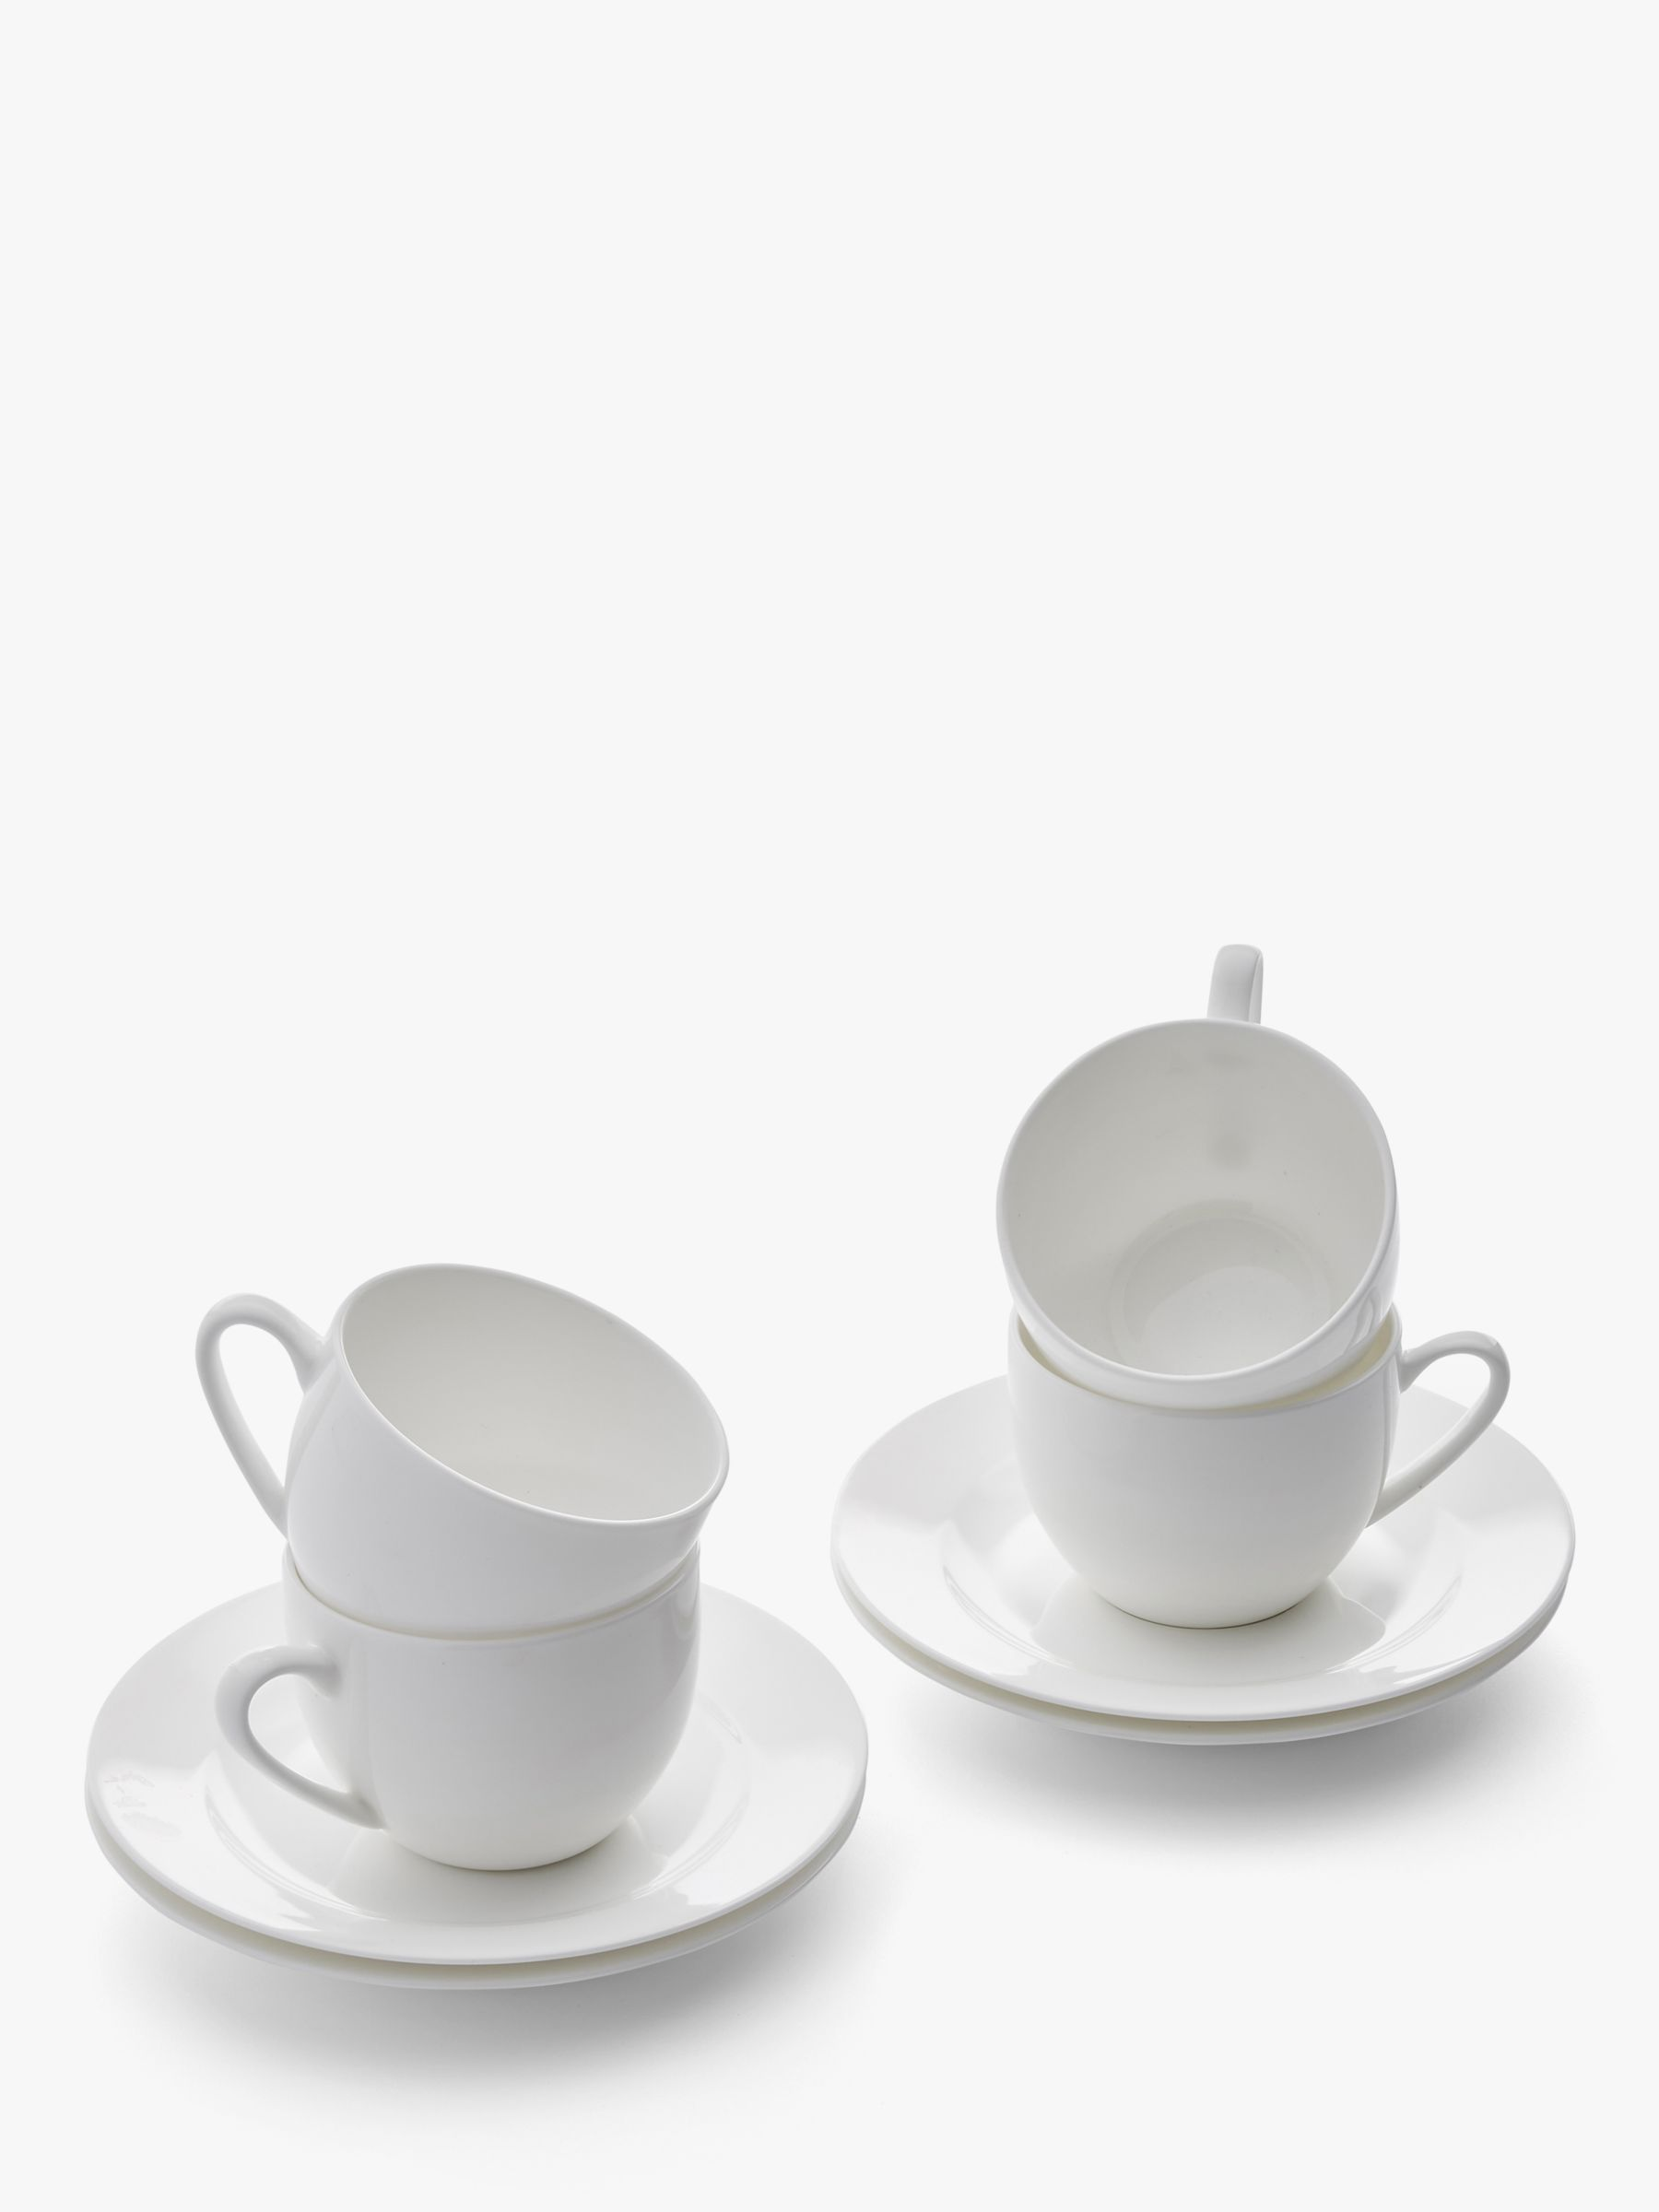 Royal Worcester Royal Worcester Serendipity Bone China Teacup & Saucer, 220ml, Set of 4, White